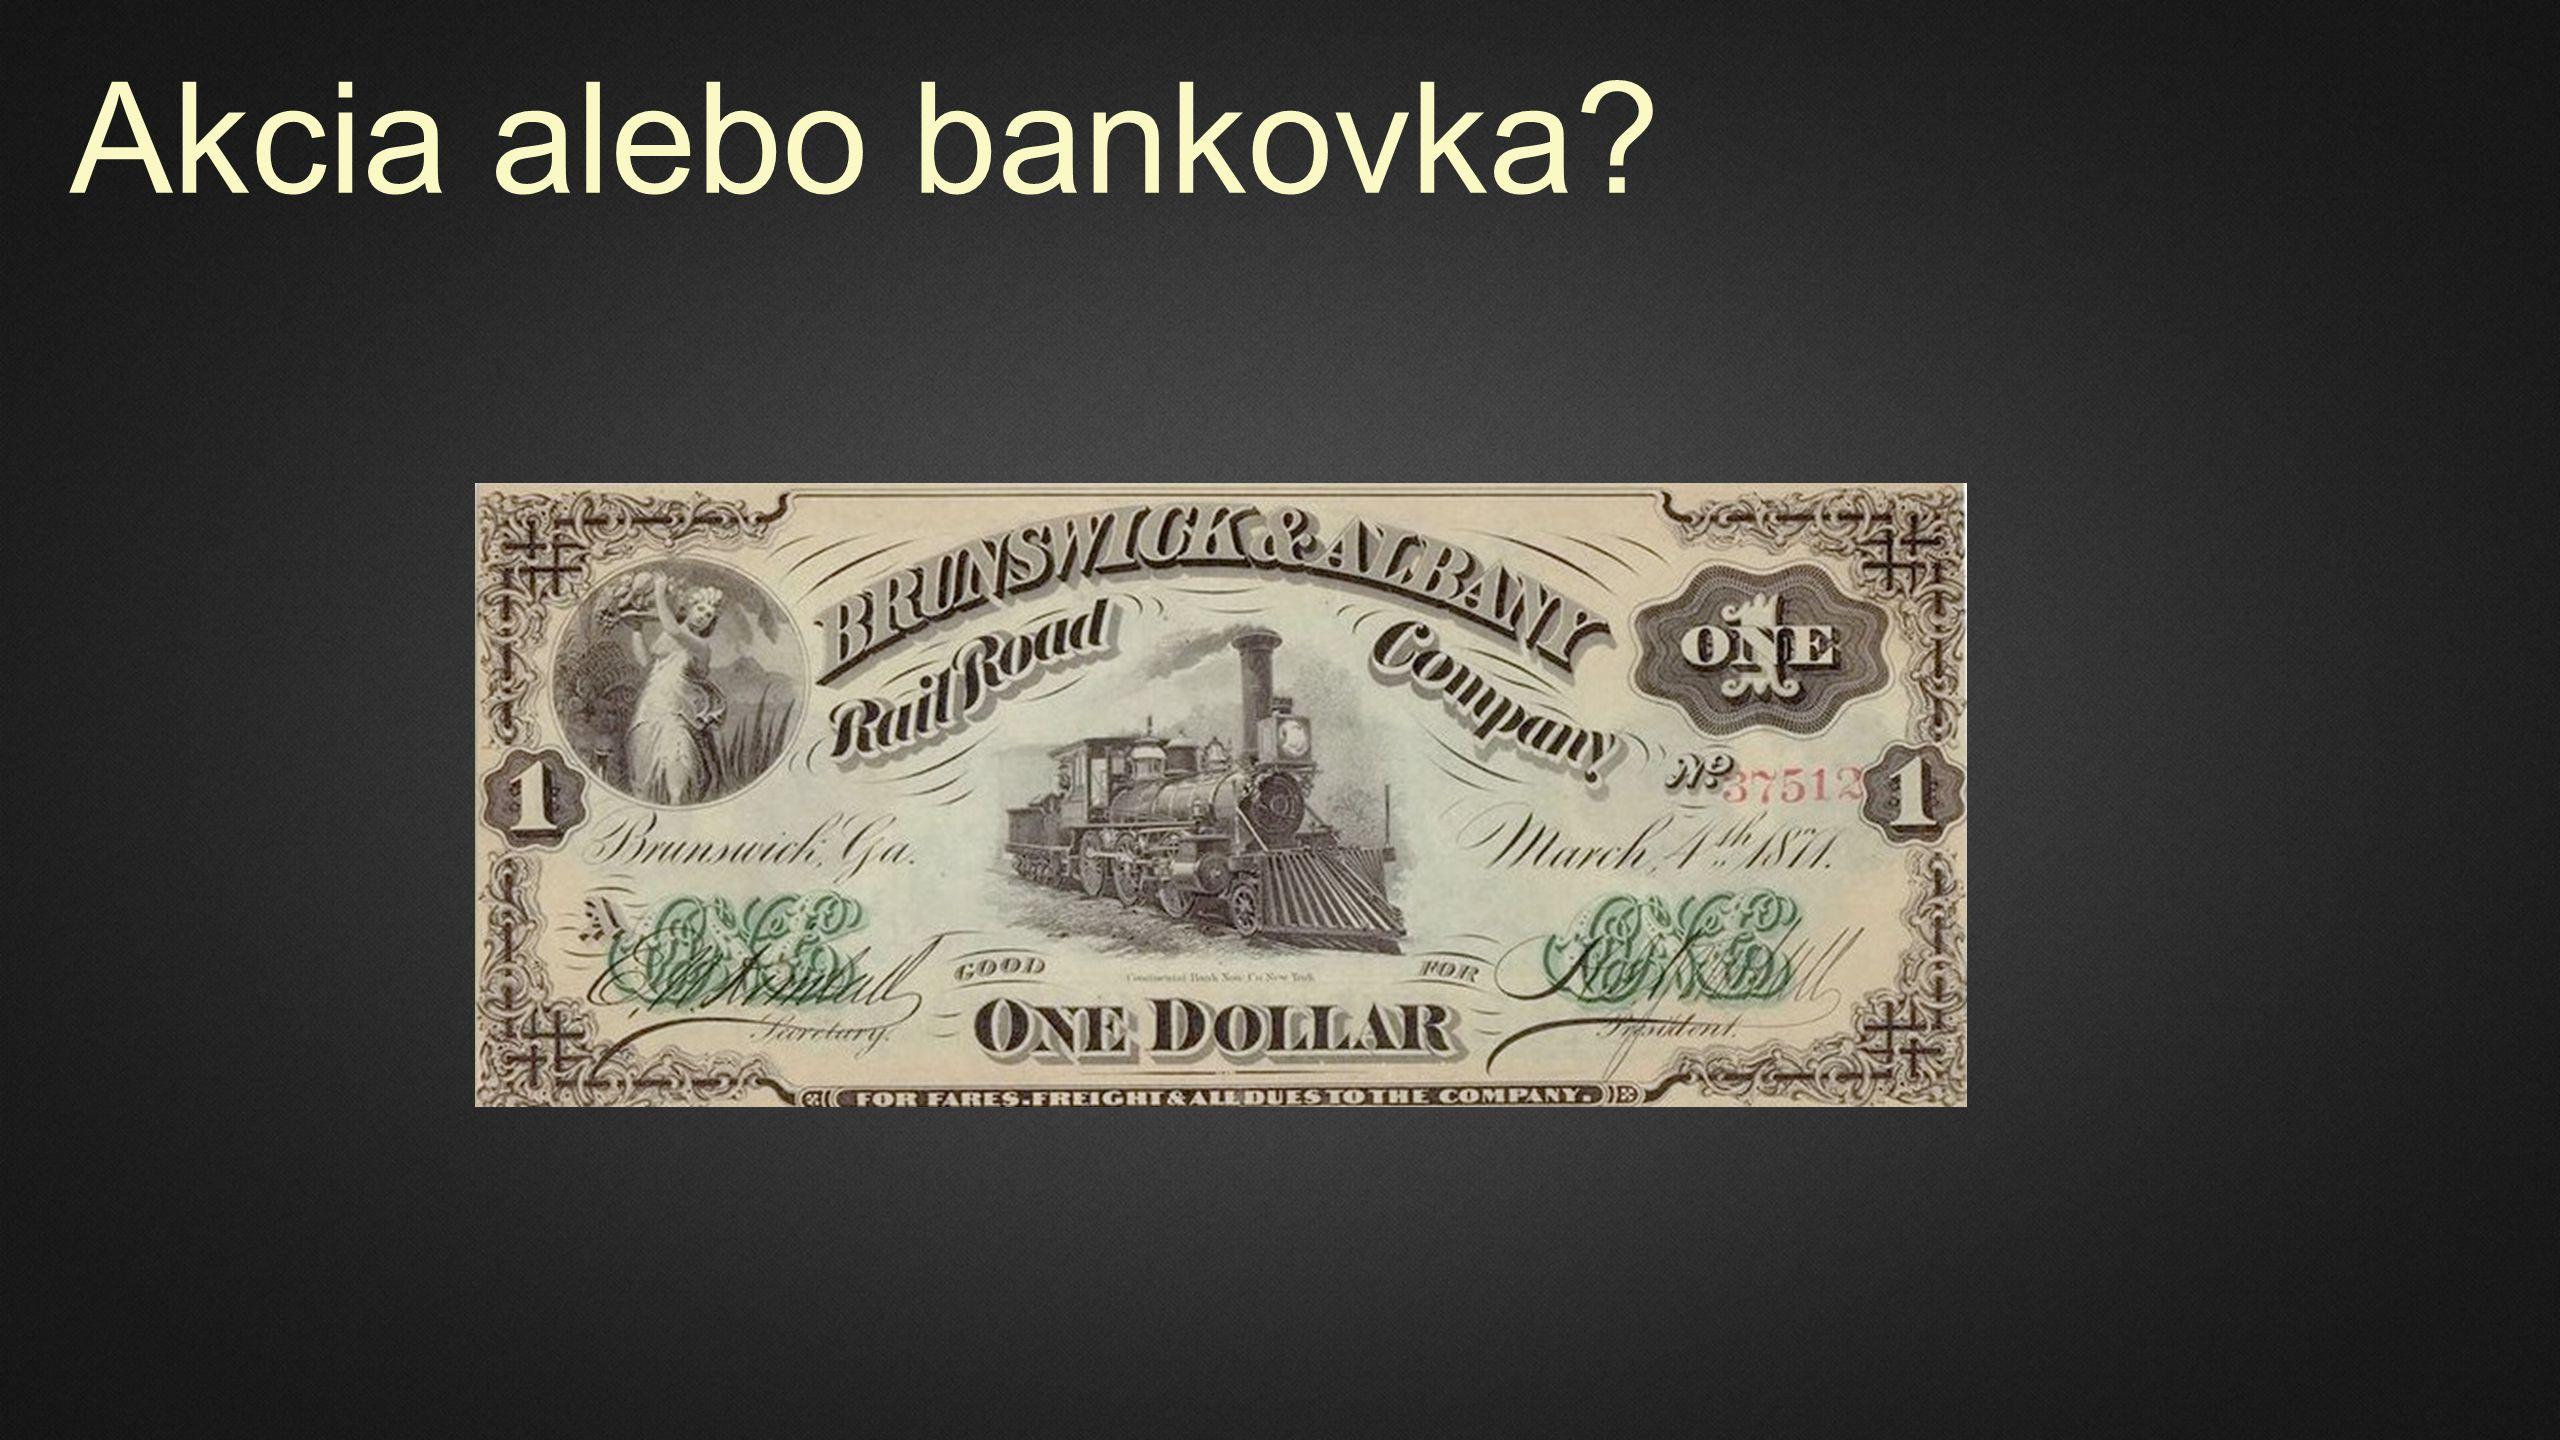 Akcia alebo bankovka